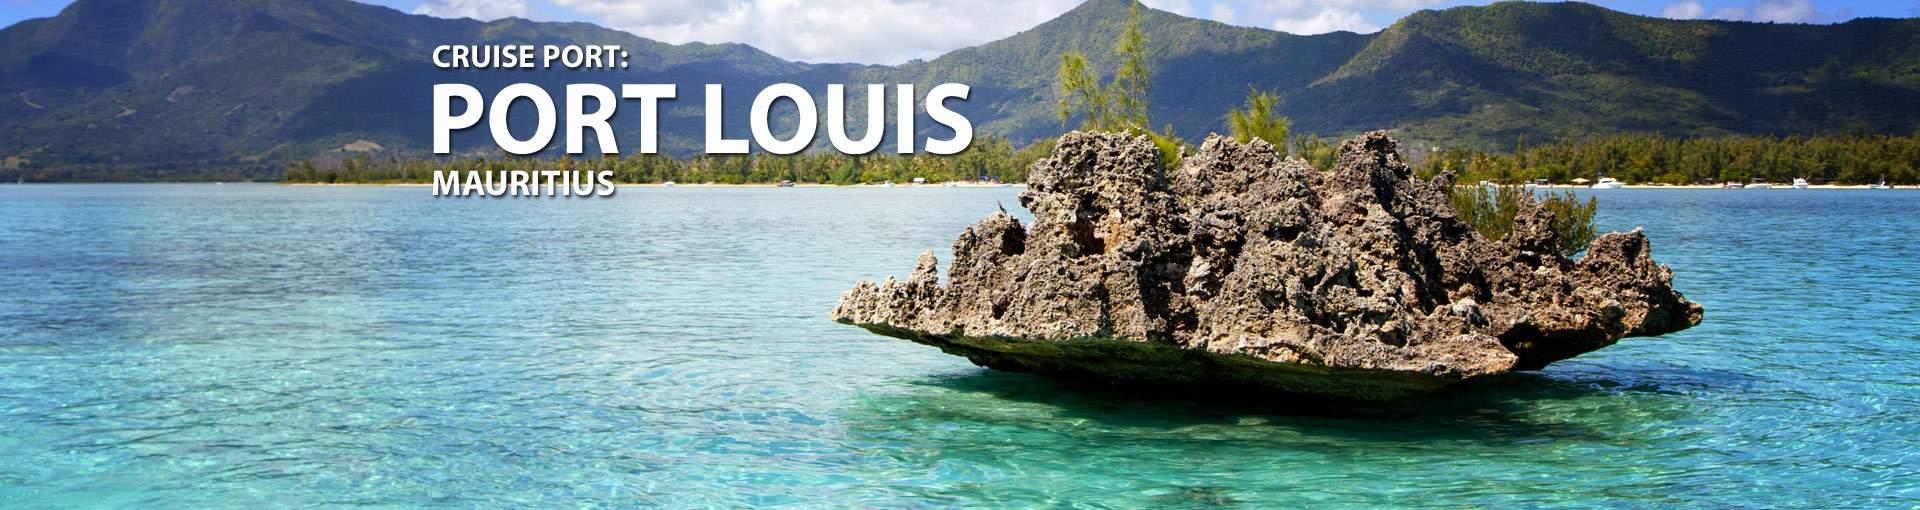 Cruises from Port Louis, Mauritius